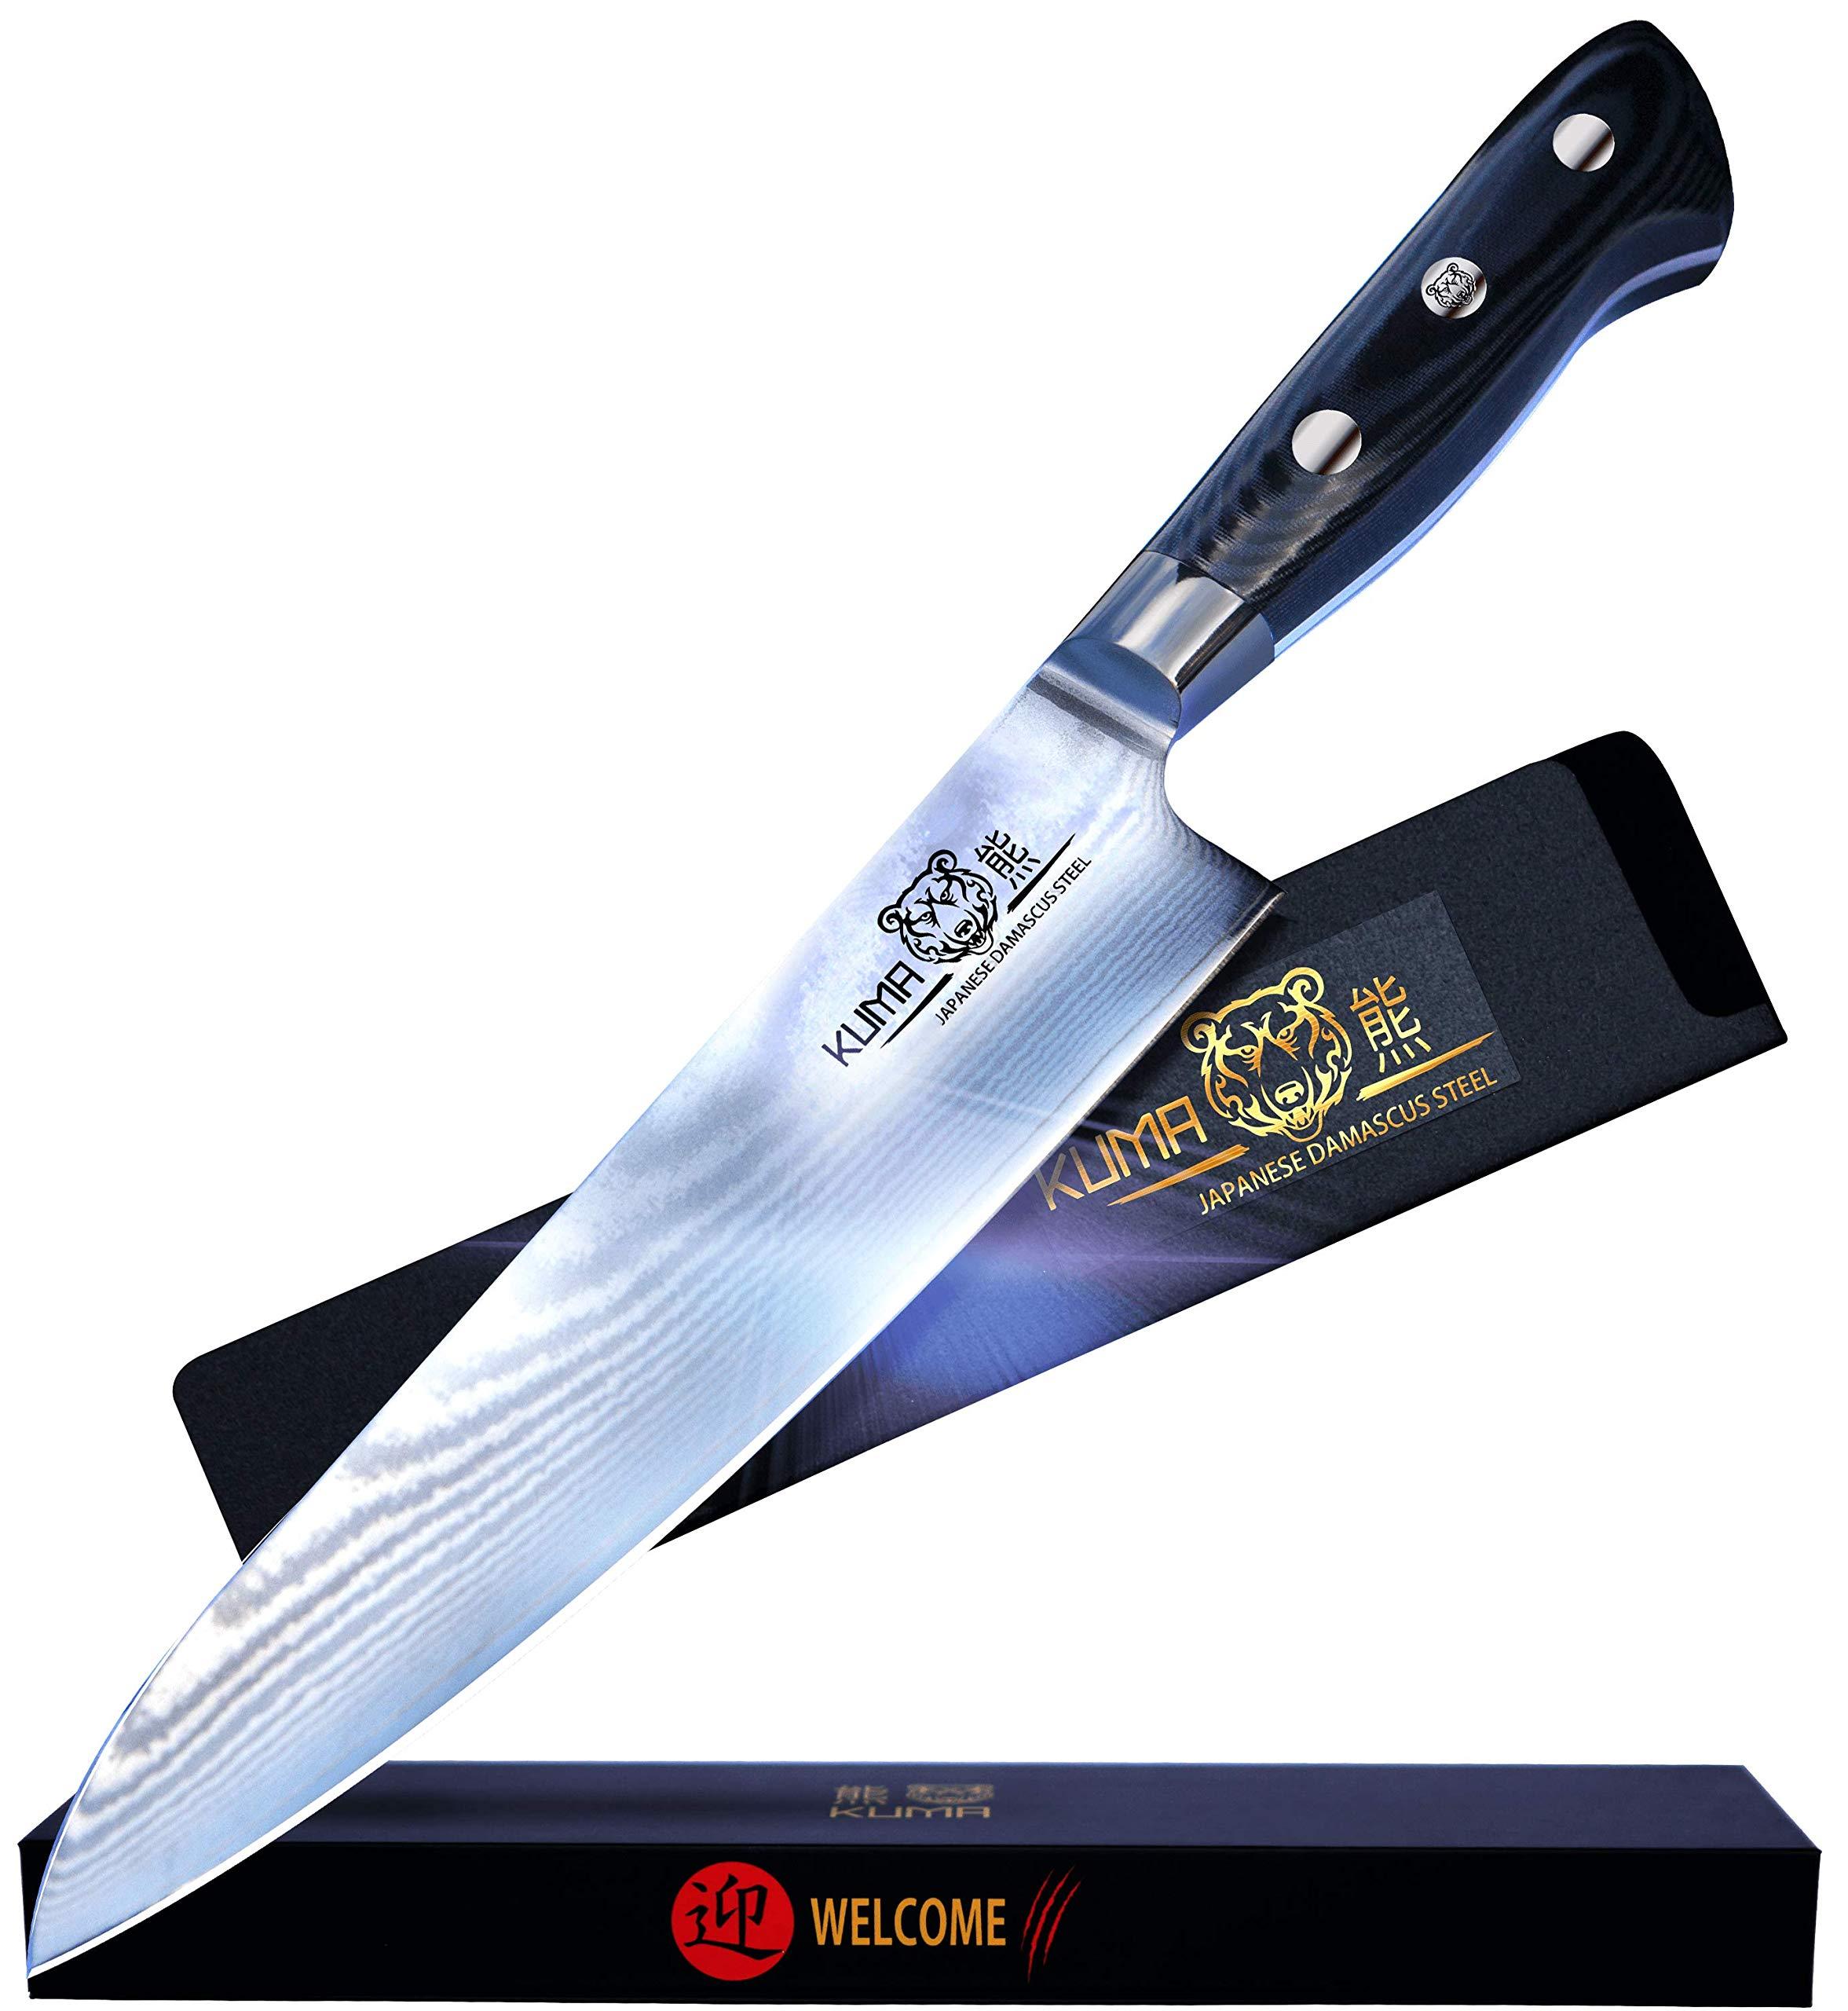 KUMA Professional Damascus Steel Knife